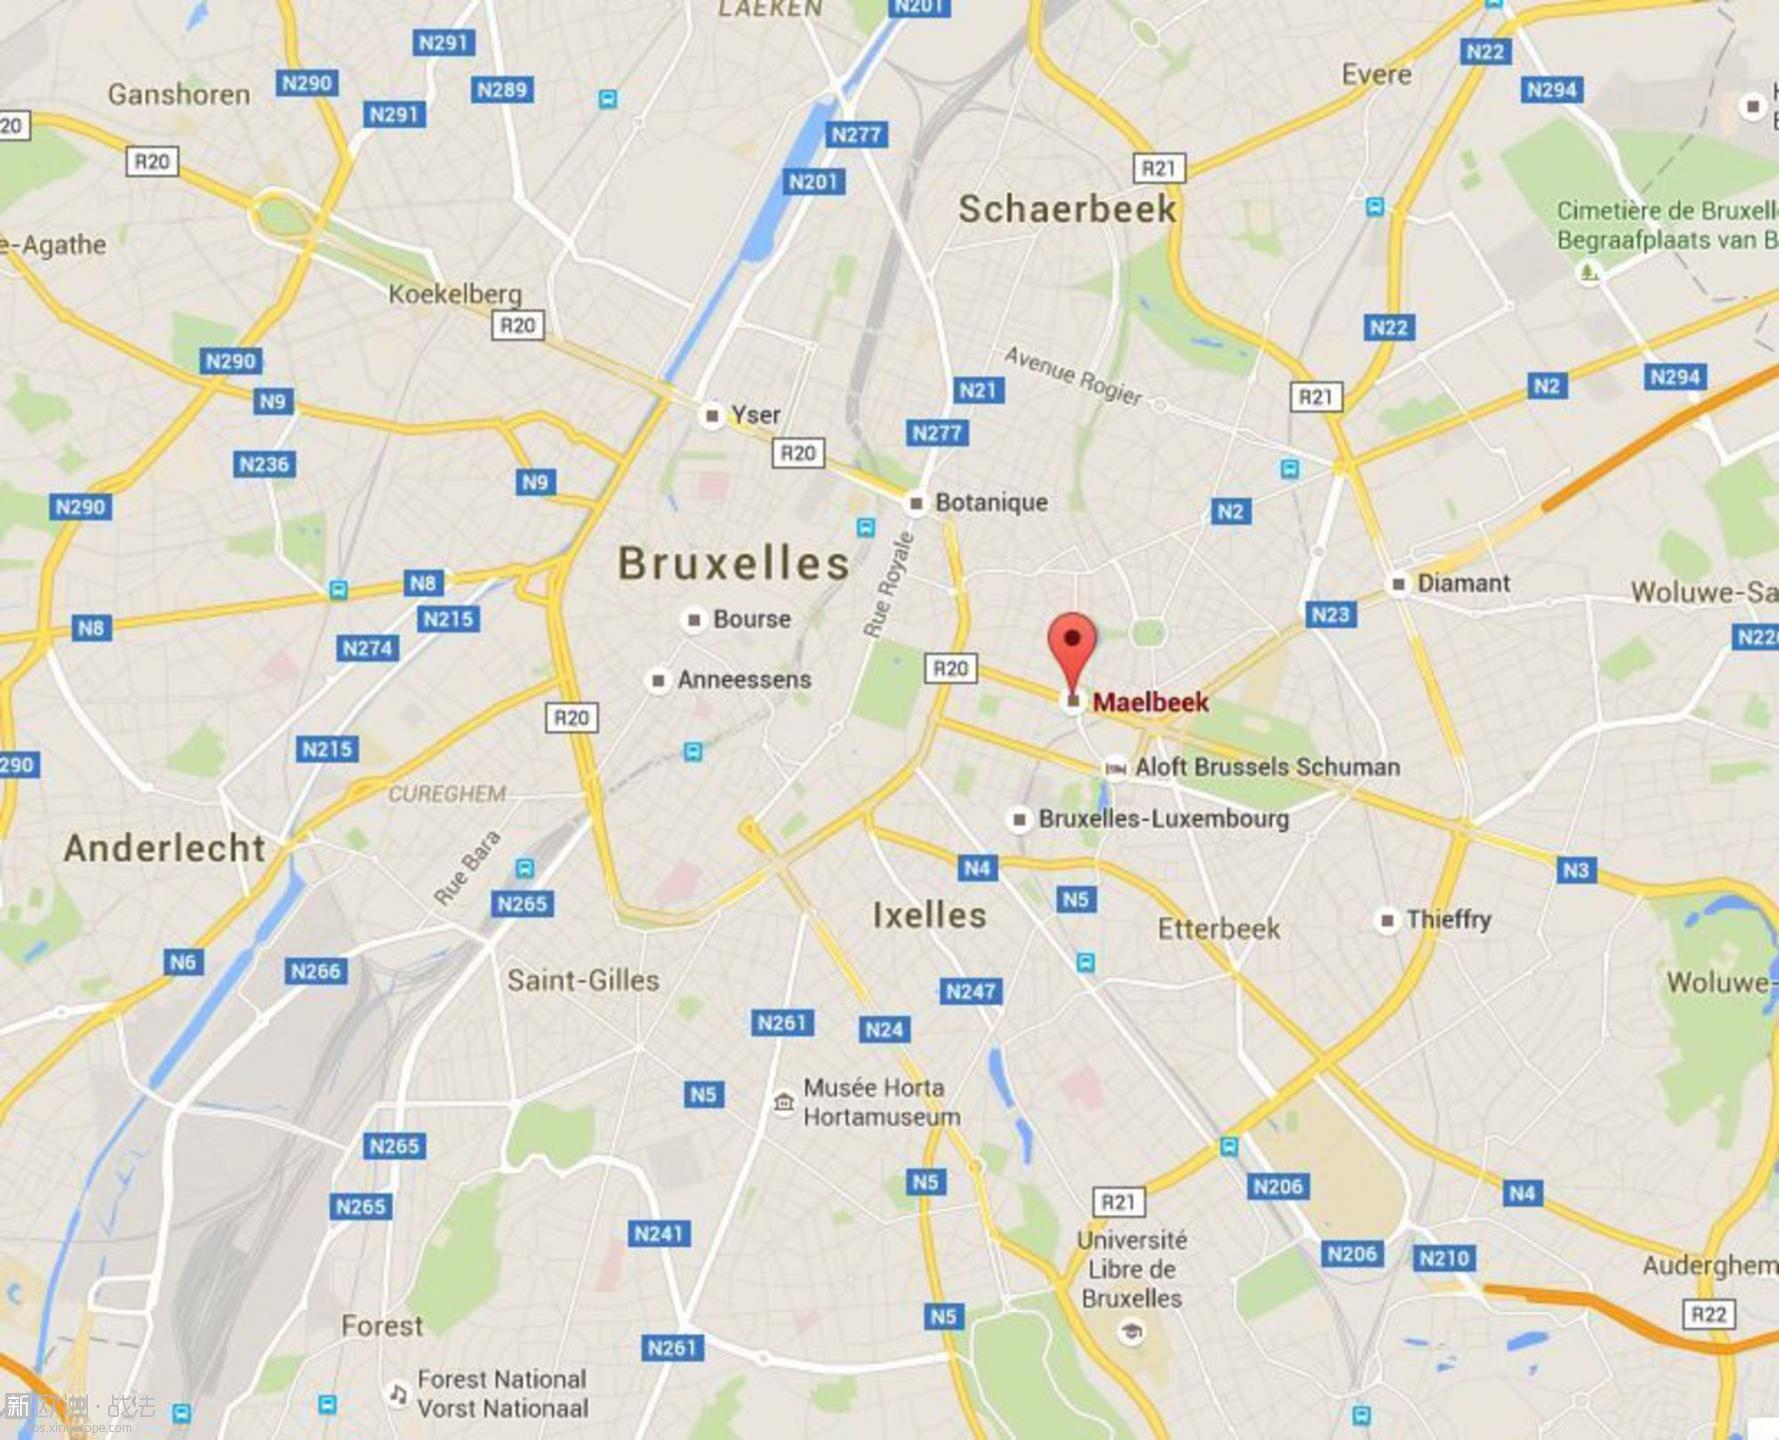 plan-de-bruxelles_5568813.jpeg